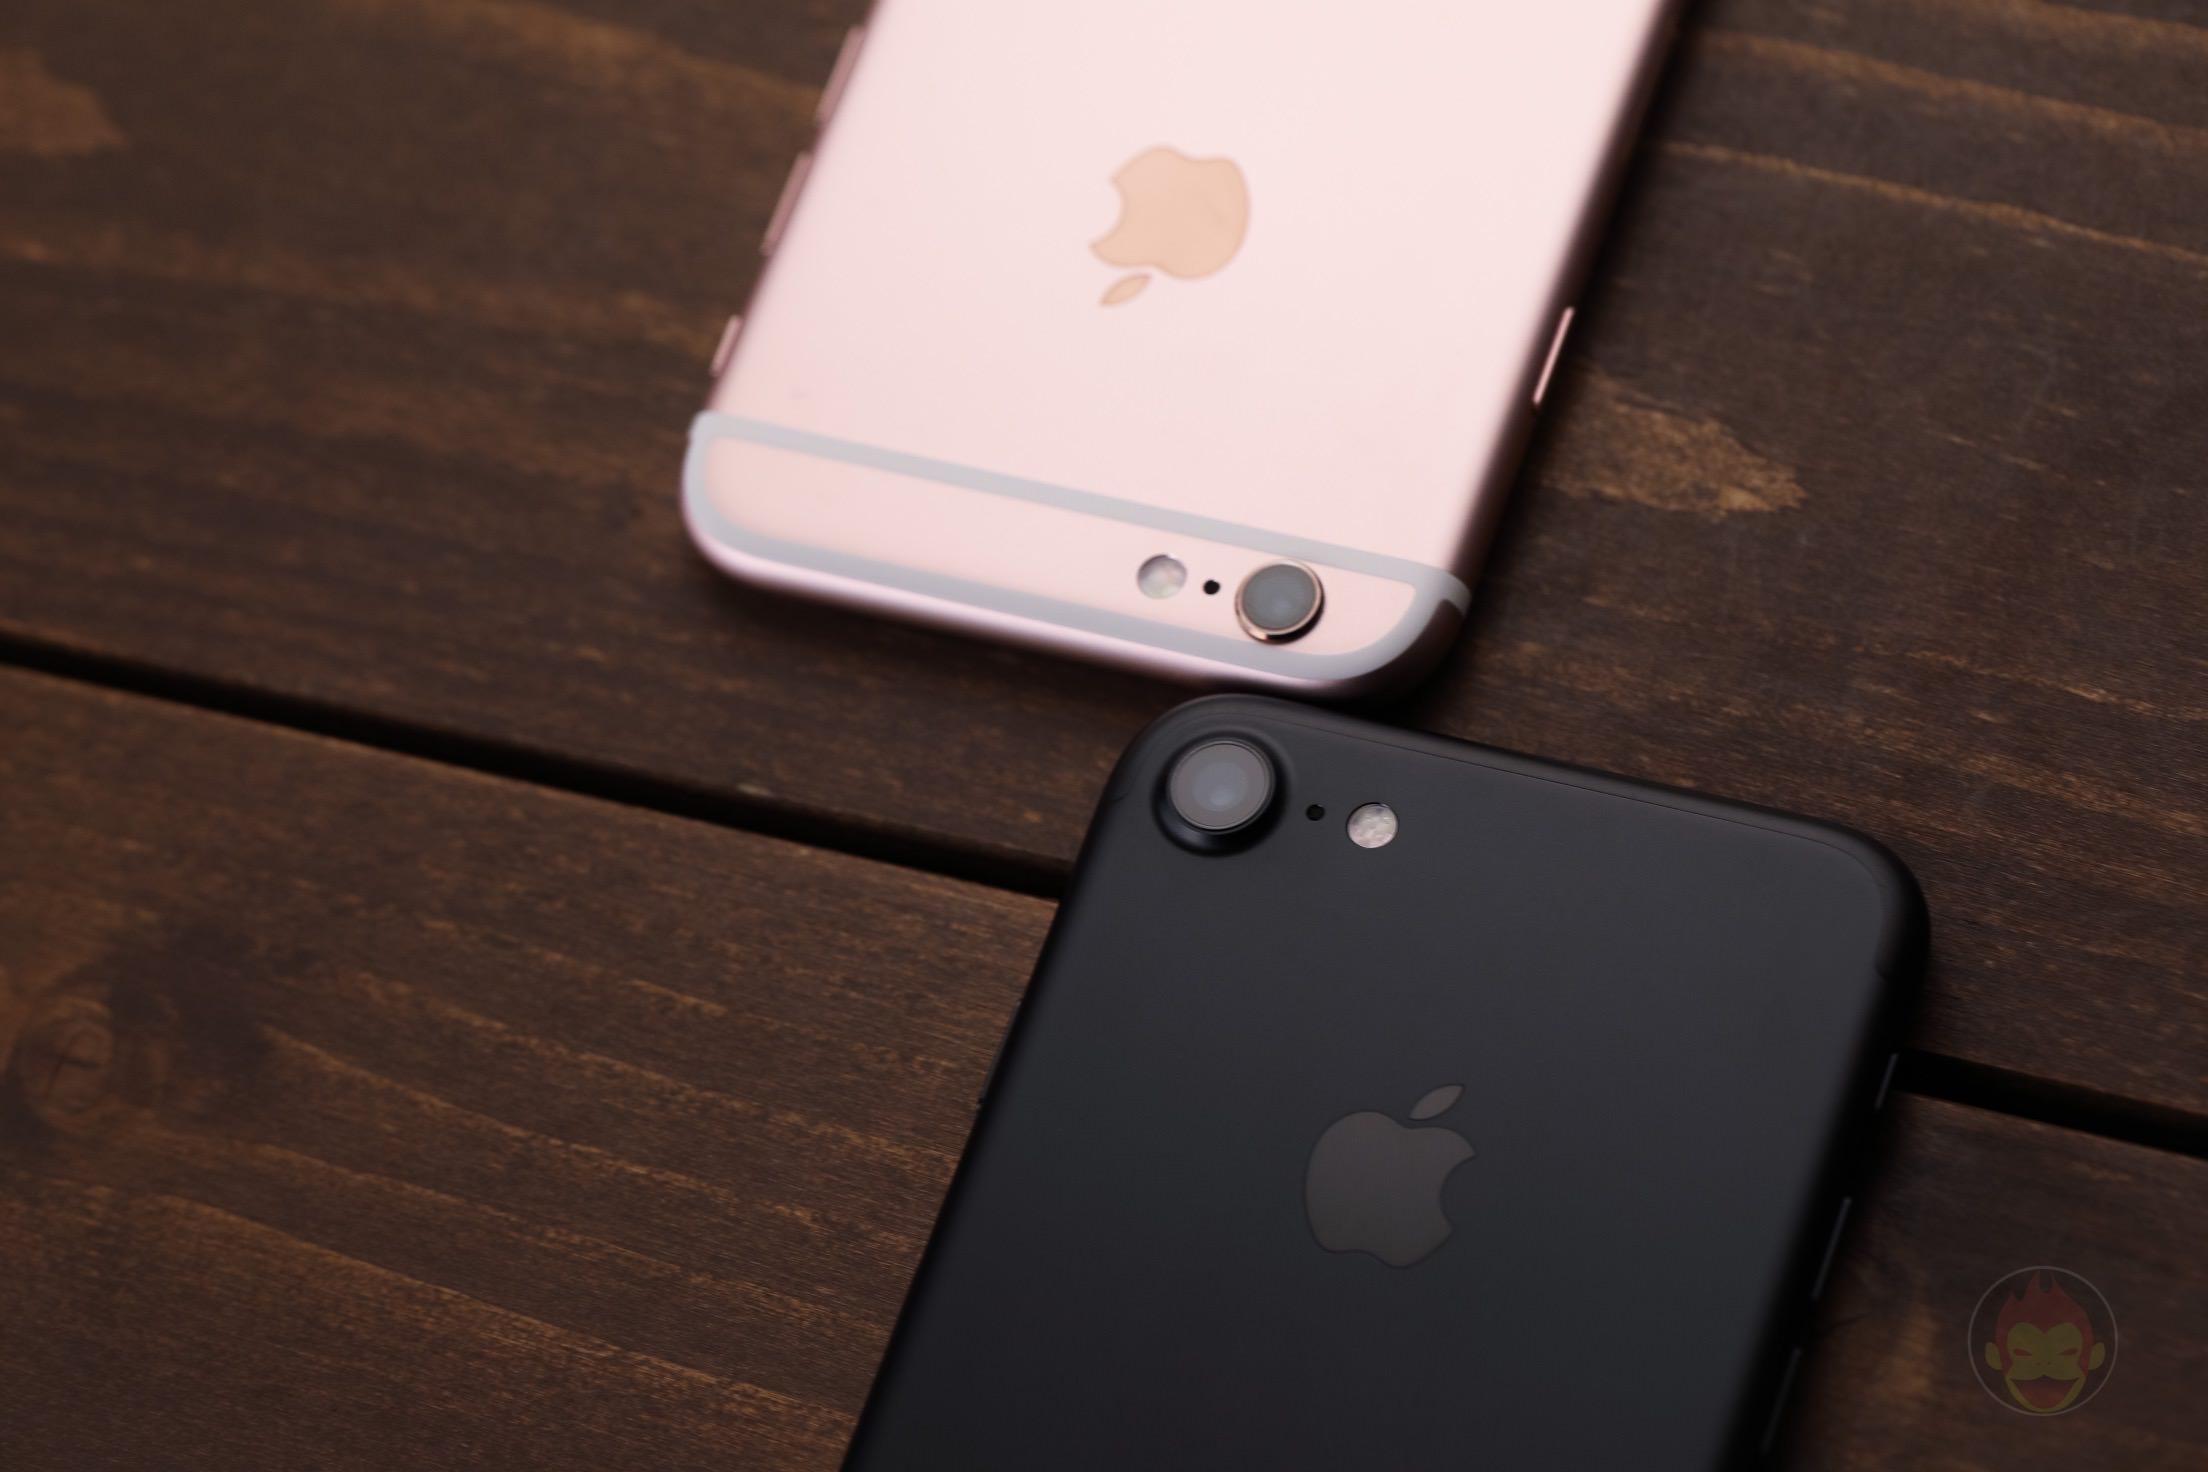 iPhone7-iPhone6s-Comparison-08.jpg